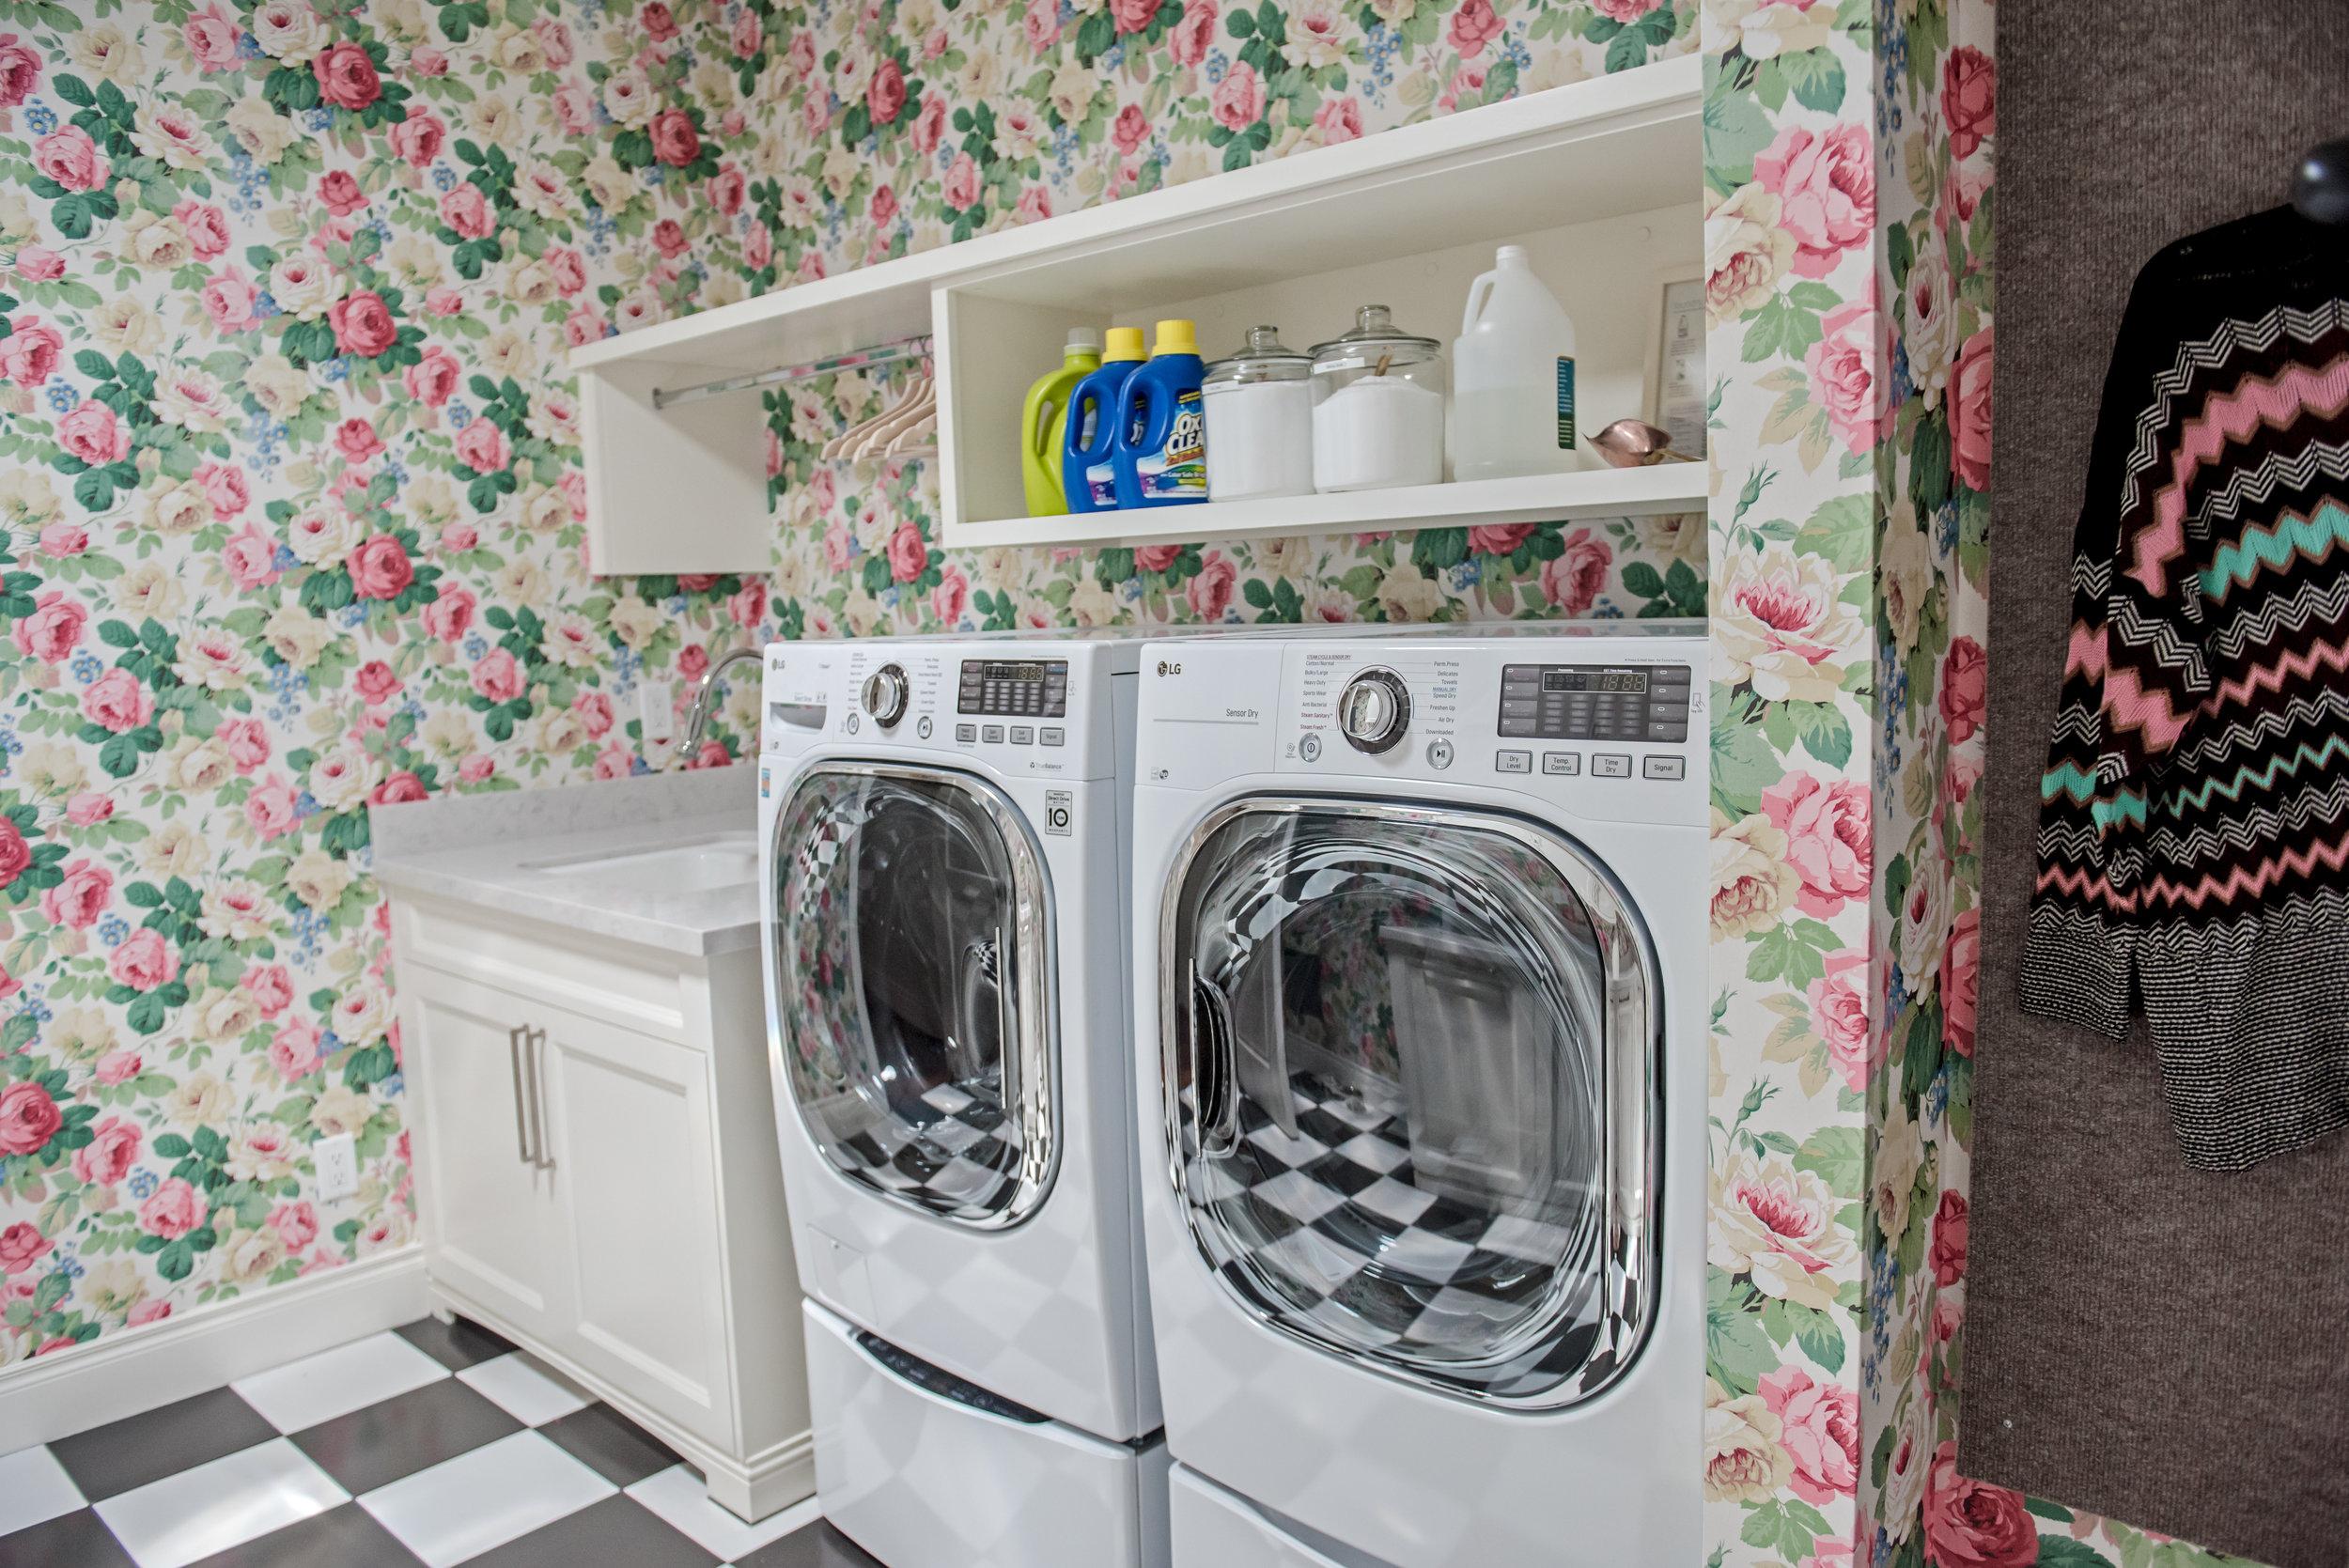 42+Laundry+Checkerboard+Floral+BlackandWhite+Feminine+Wallpaper.jpg